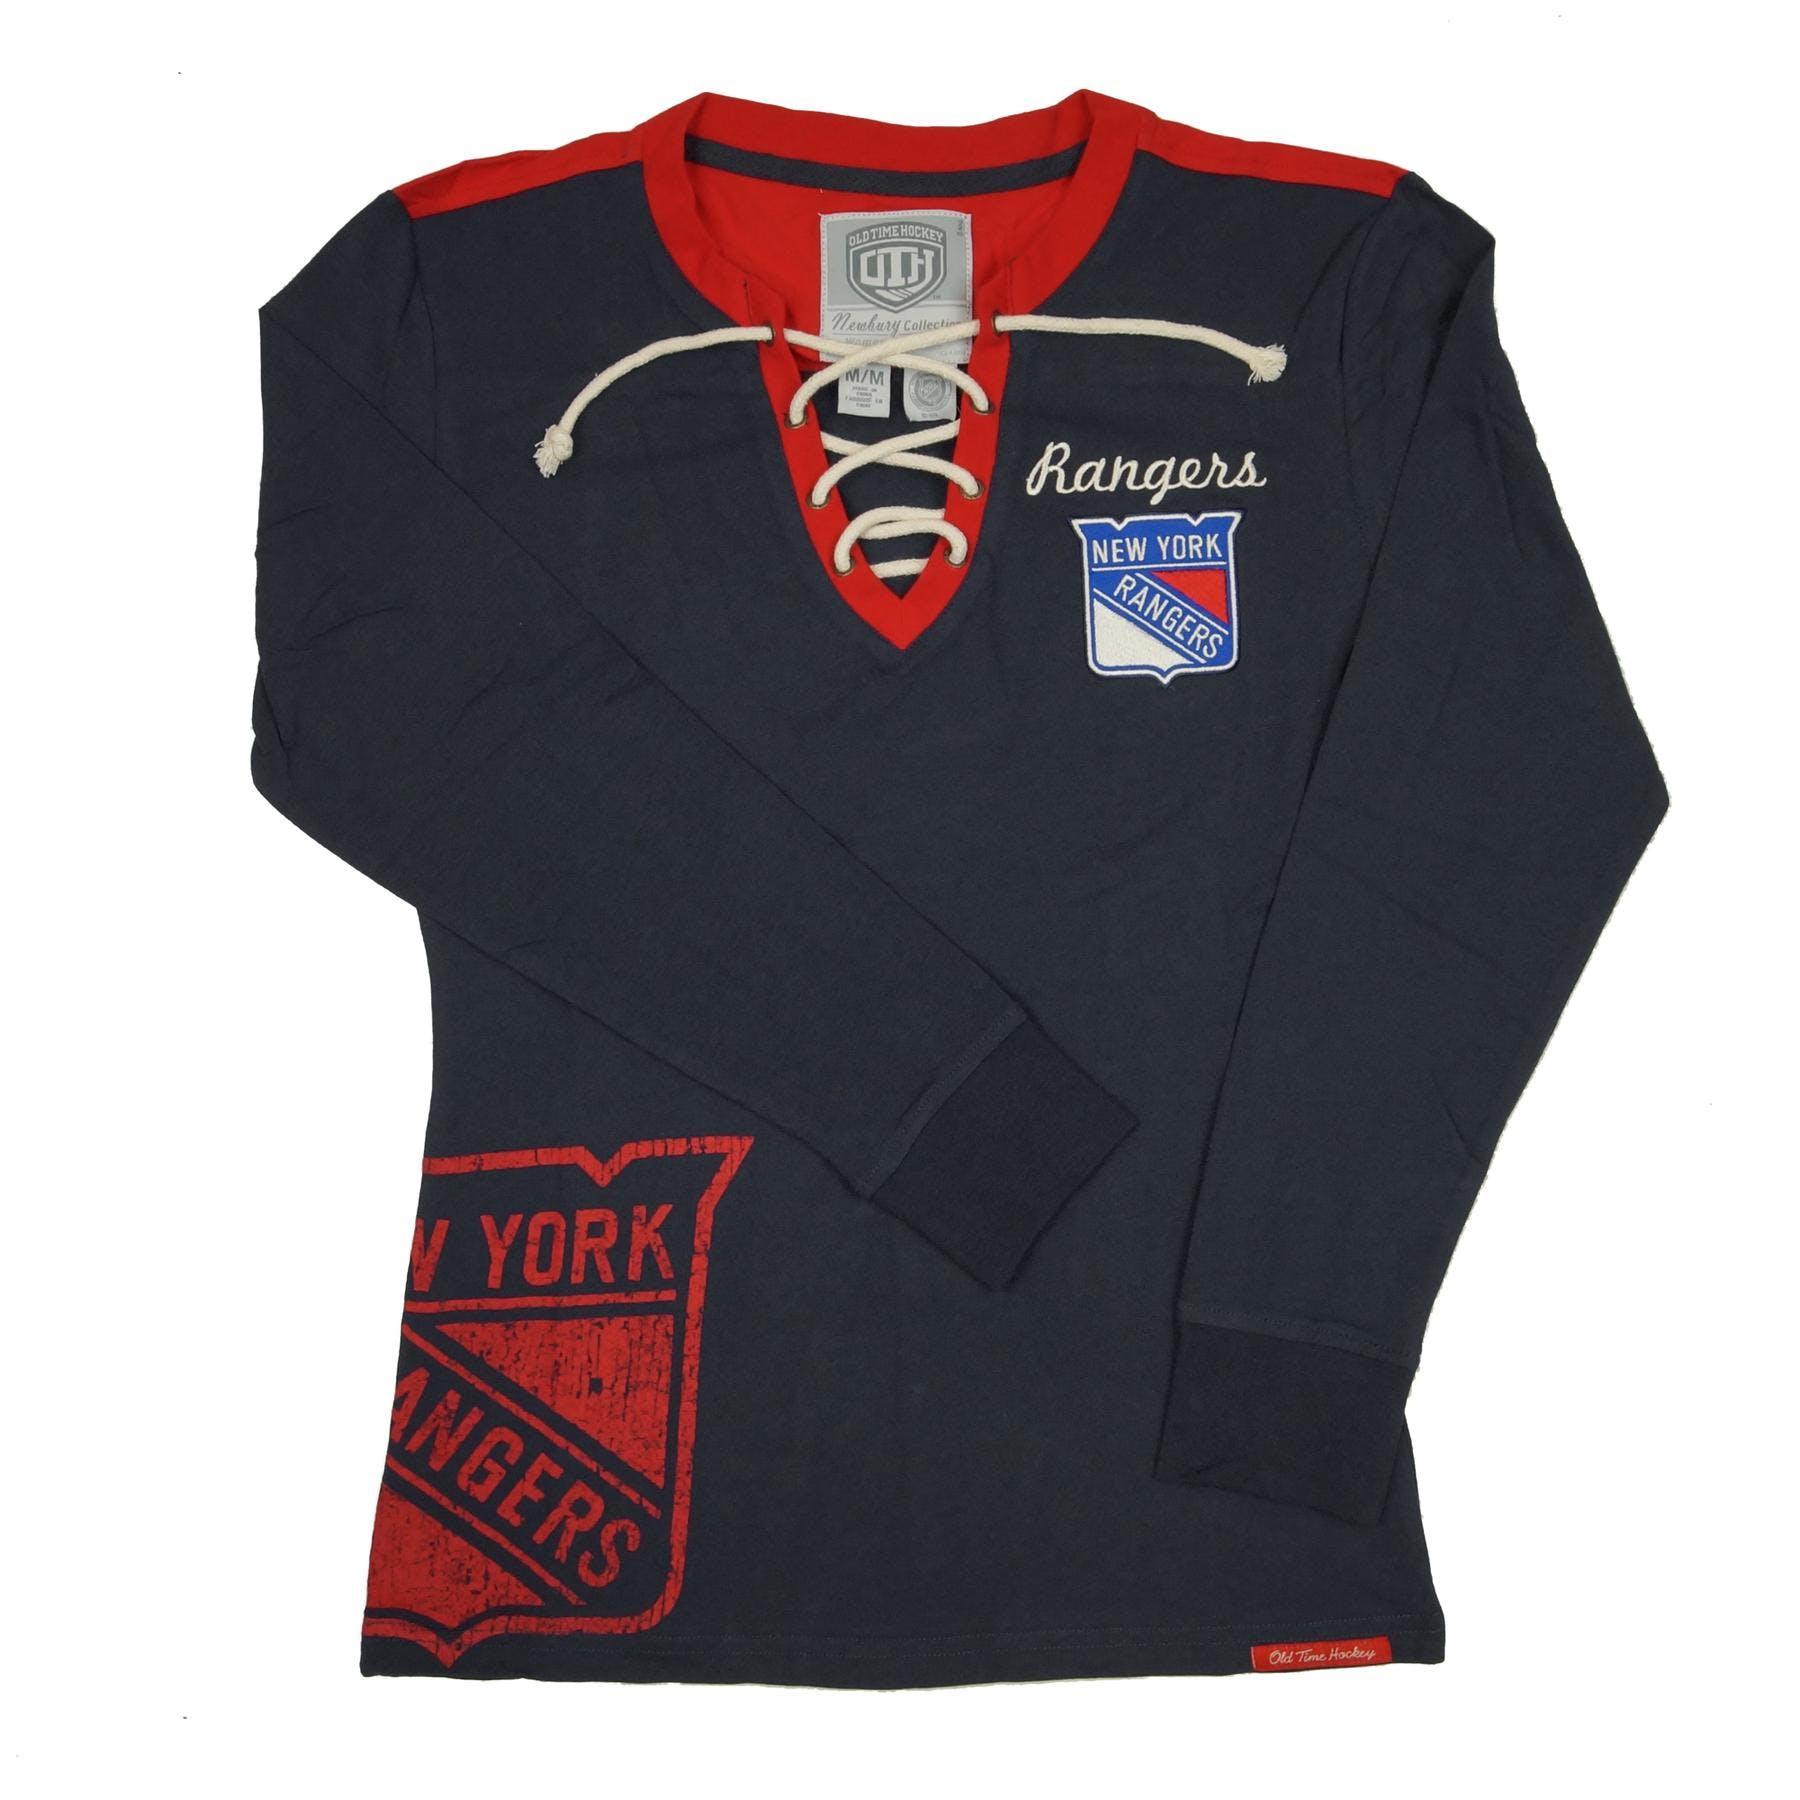 New York Rangers Old Time Hockey Navy Rachel L S Jersey Tee Shirt ... 9eb8242ca40